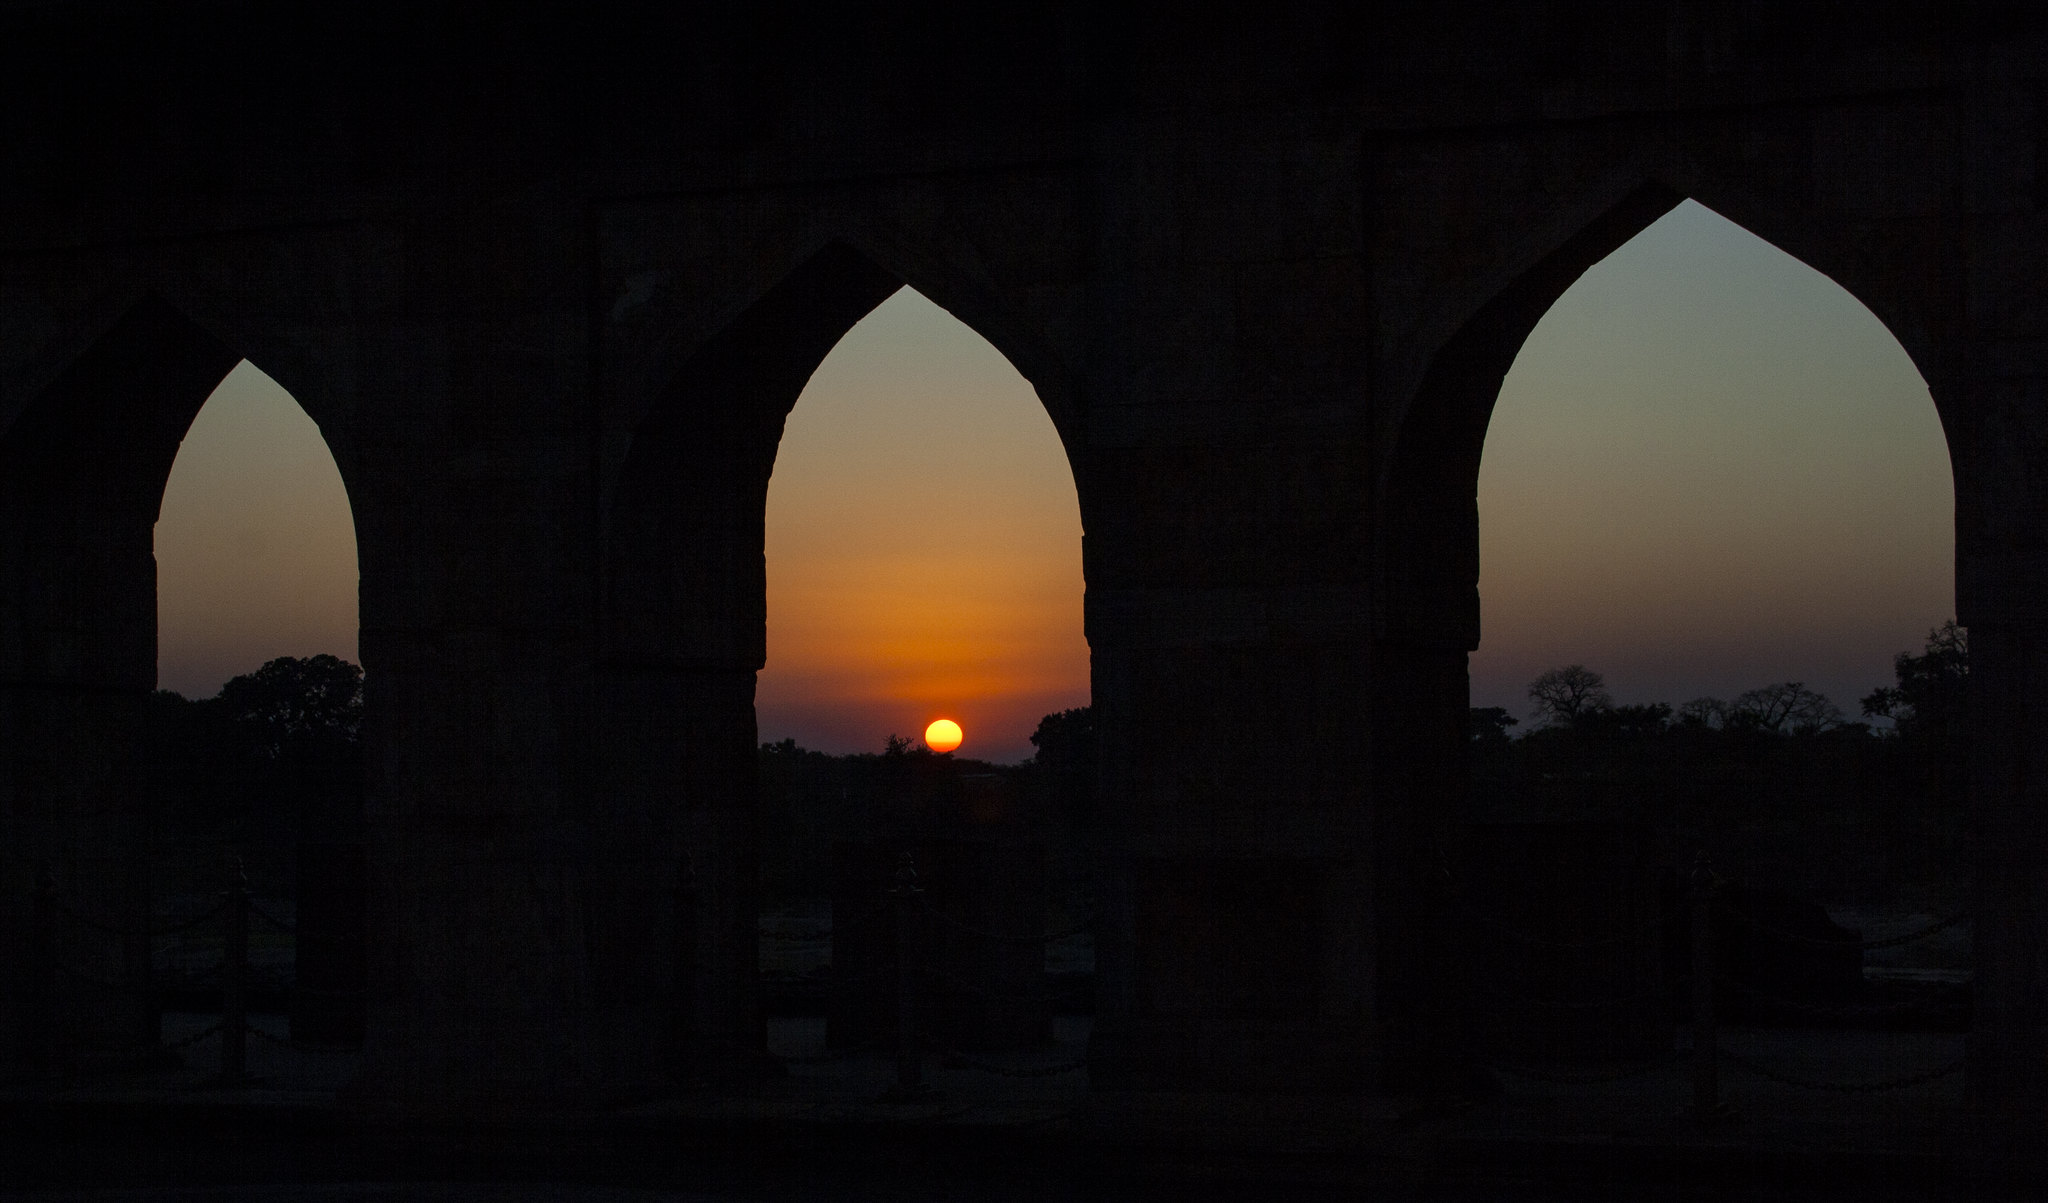 Jahaz Mahal in Mandu, Madhya Pradesh, India